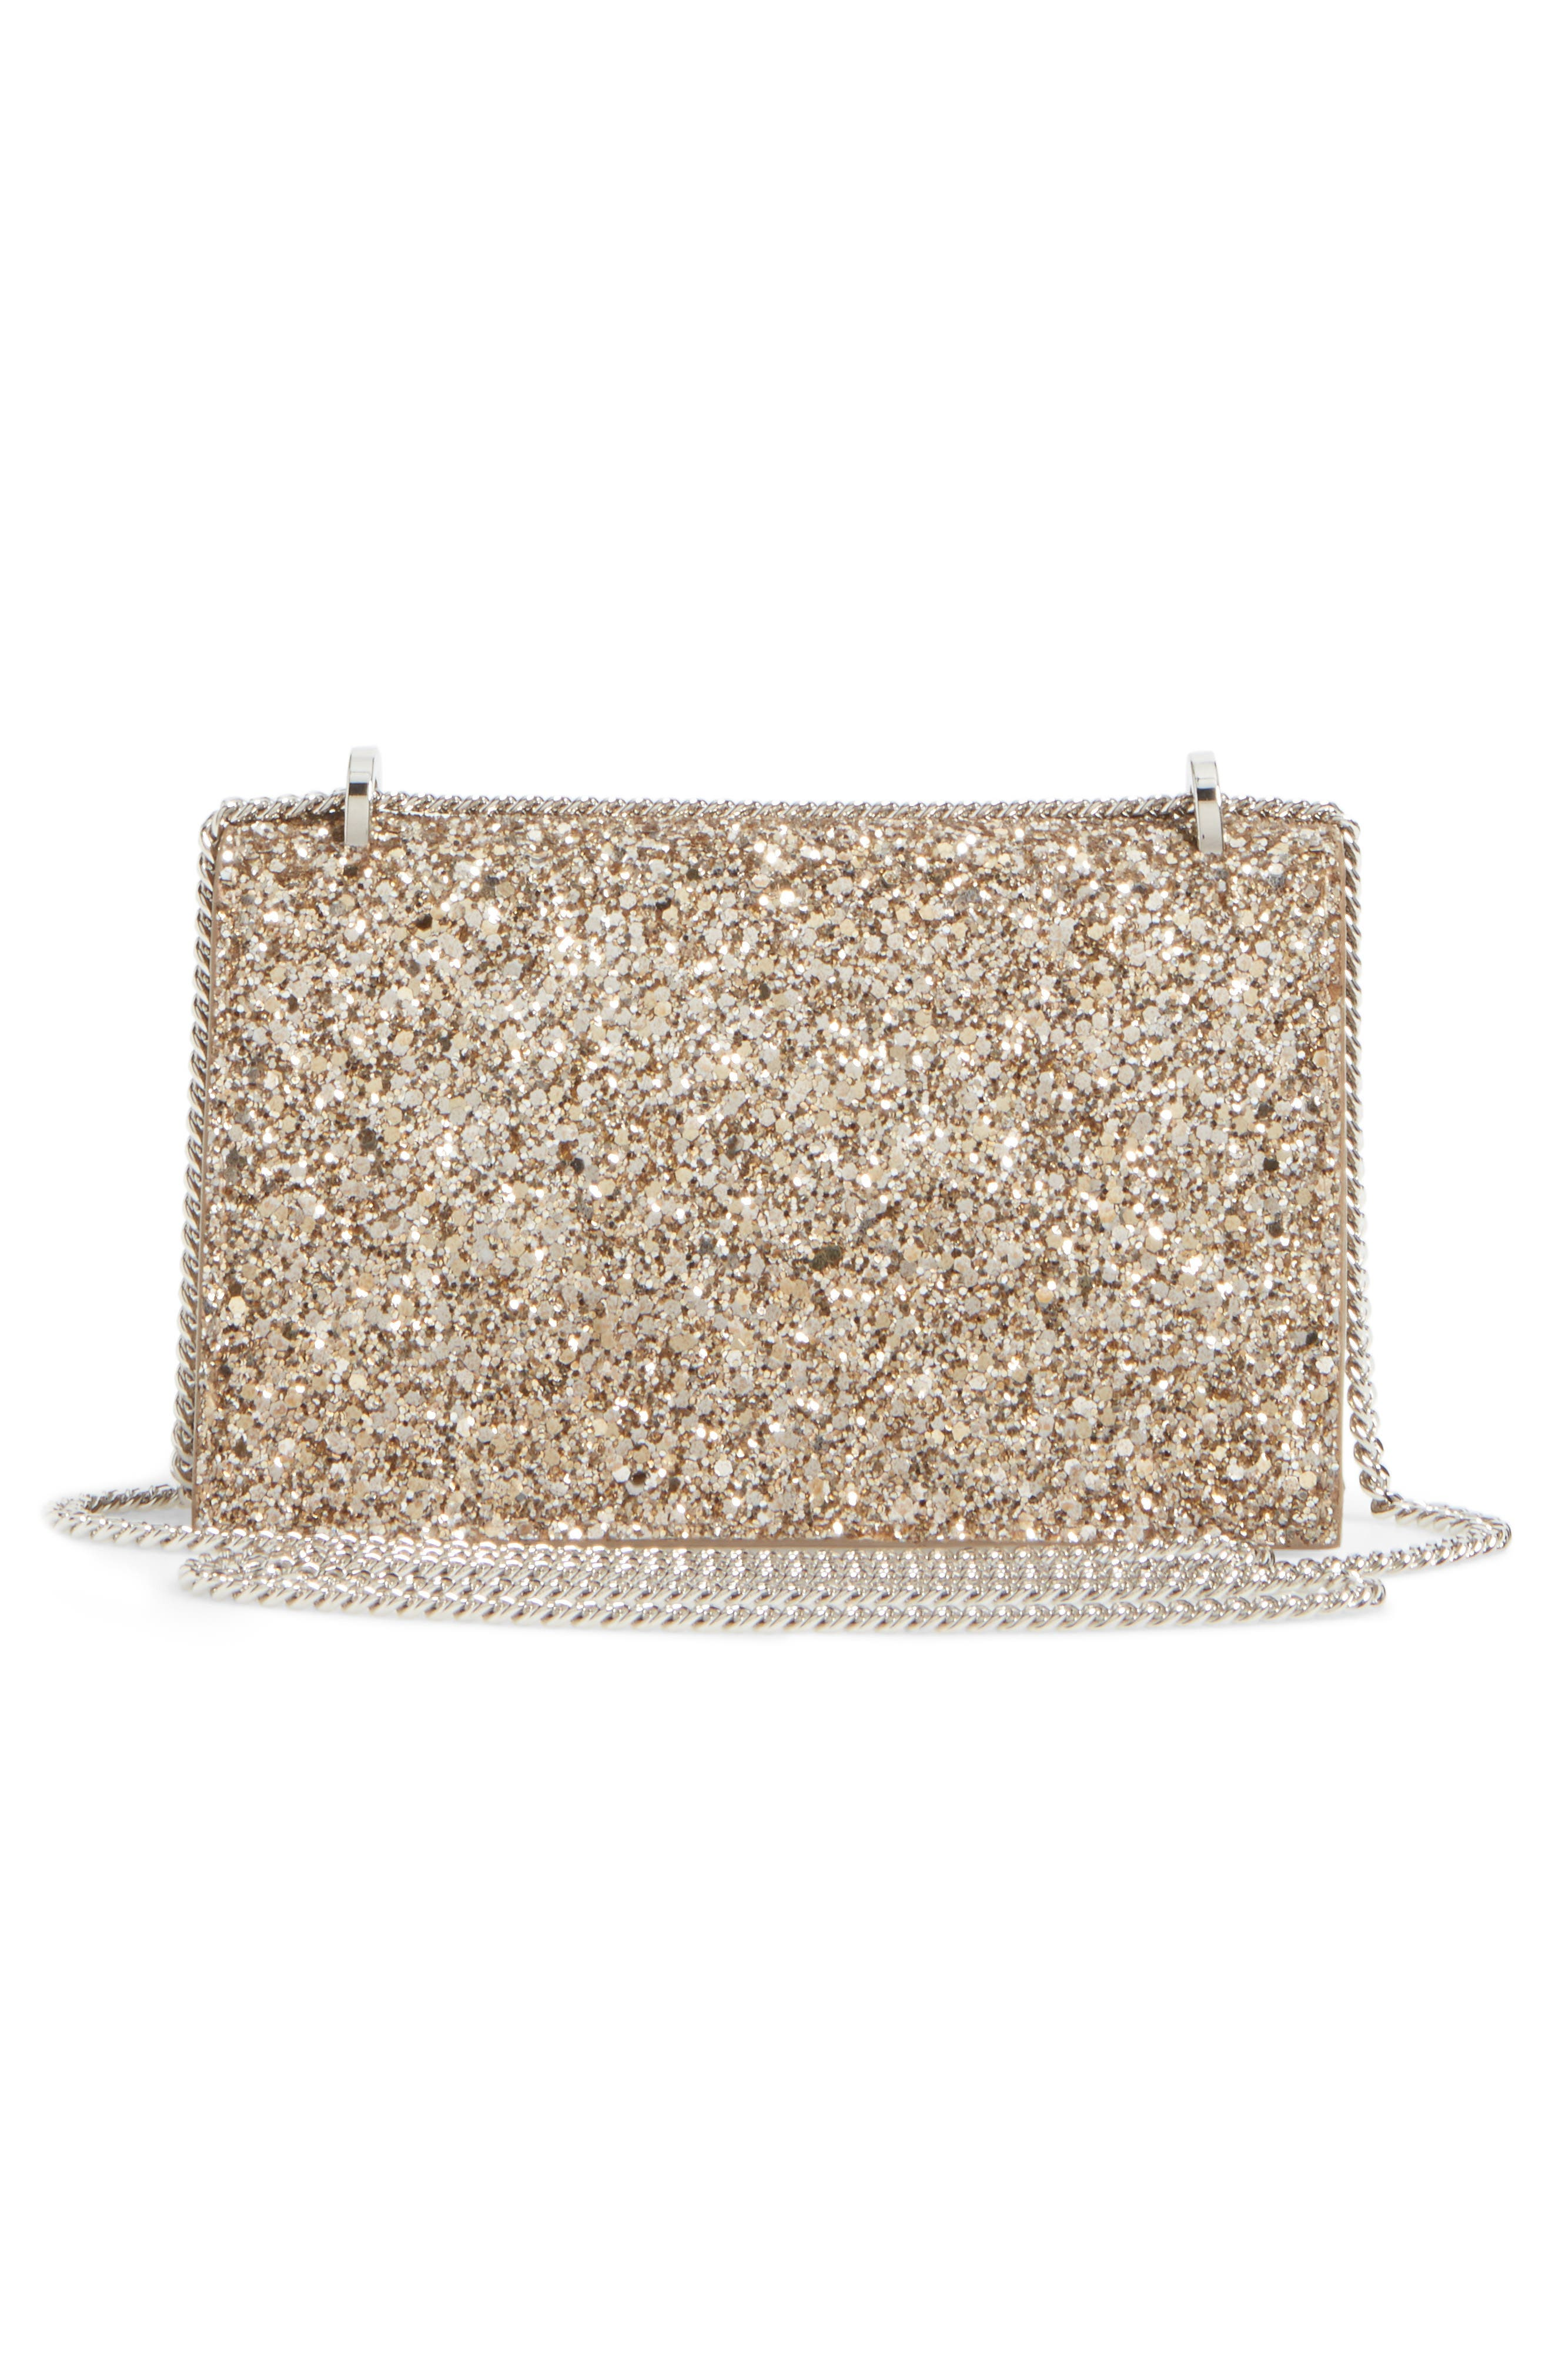 Finley Shadow Glitter Shoulder Bag,                             Alternate thumbnail 3, color,                             Antique Gold